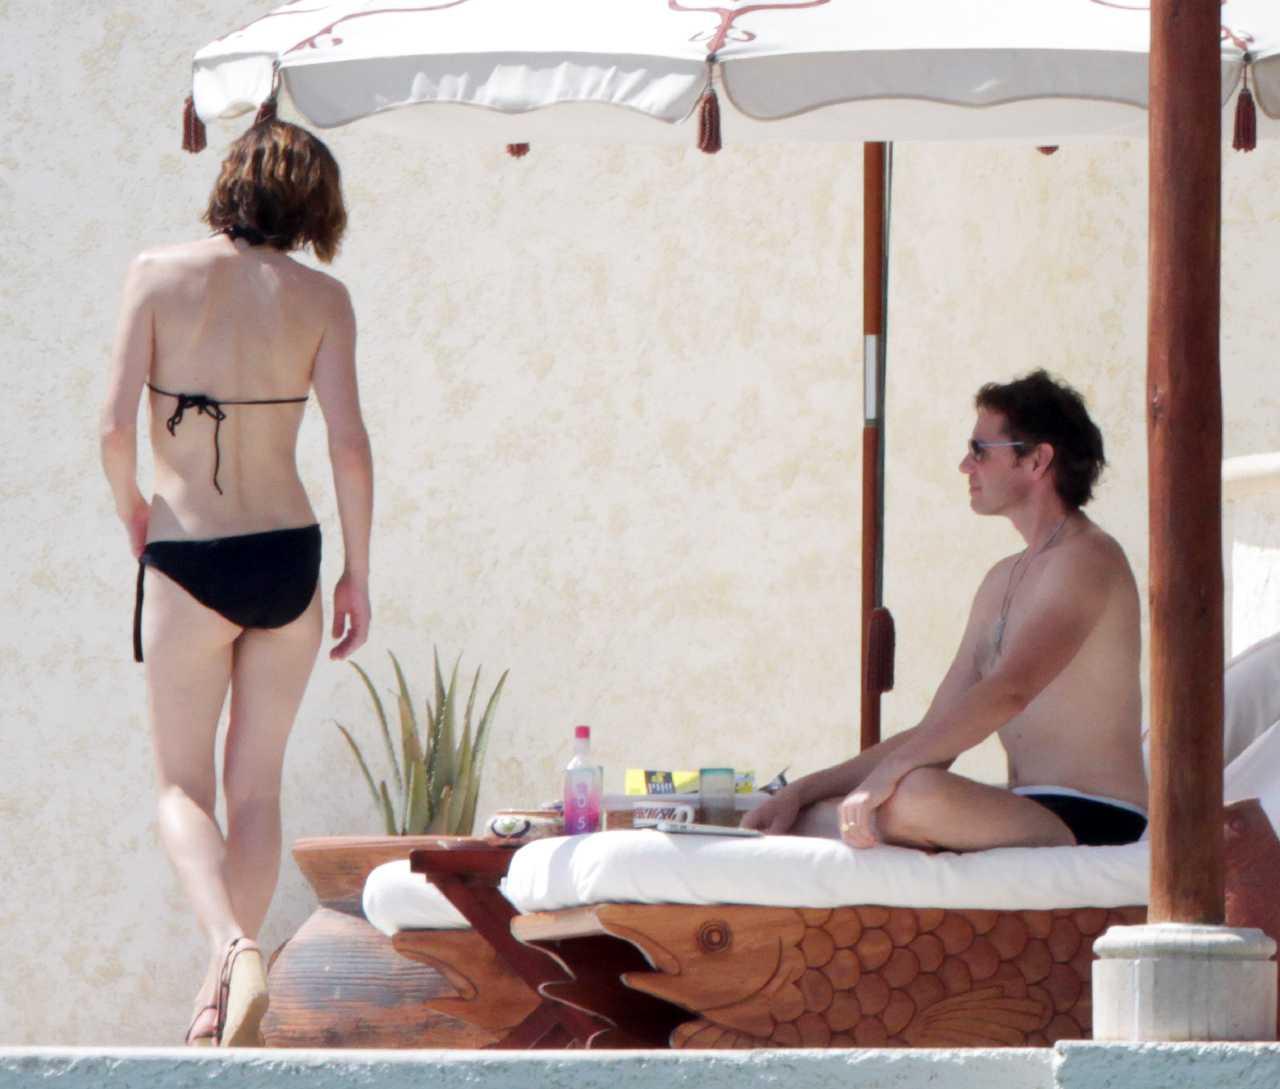 http://2.bp.blogspot.com/-GmEwuaRg_Aw/TrhUPZsXg7I/AAAAAAAAim0/01HbZcpQppo/s1600/Milla+Jovovich%25E2%2580%2599s+Hottest+Bikini+and+Lingerie+Pics+02.jpg